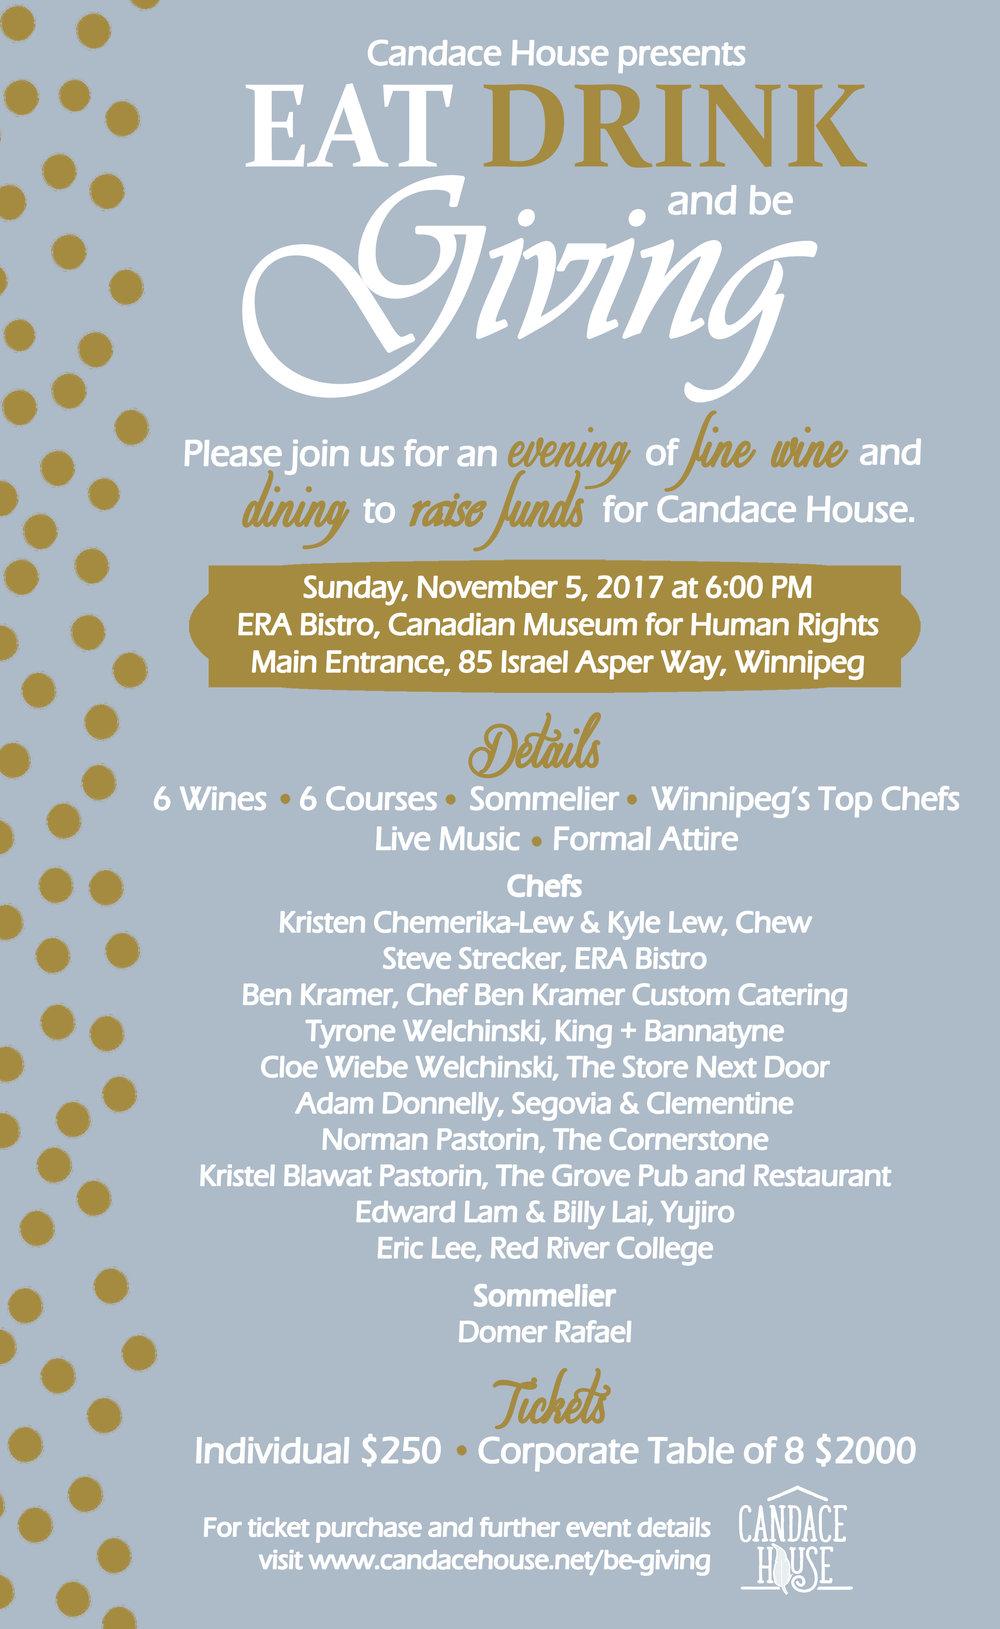 2017.09.25 Chef Poster.jpg